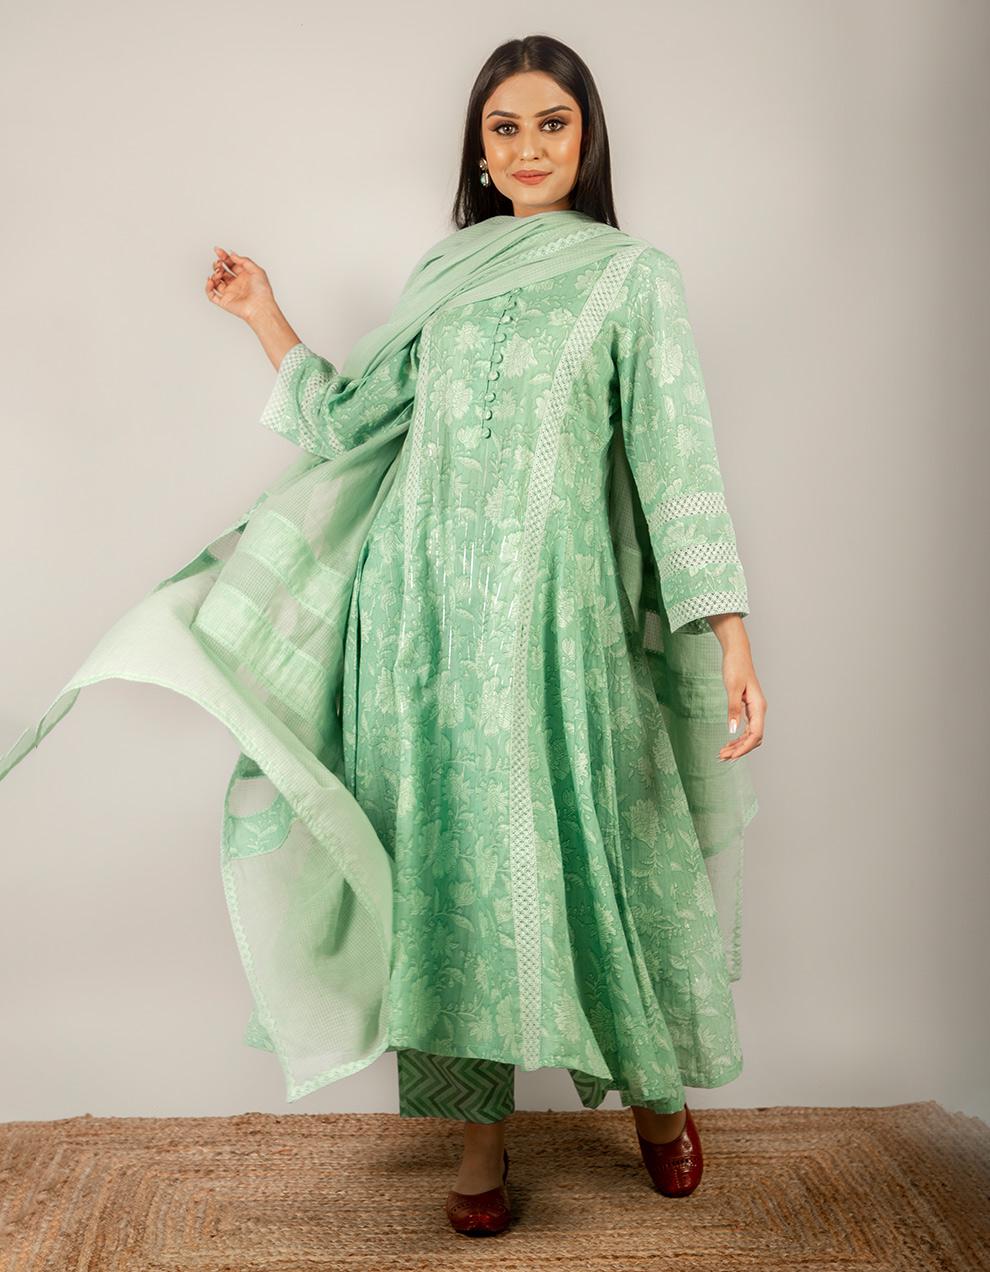 green color cotton kurta with pants and dupatta.